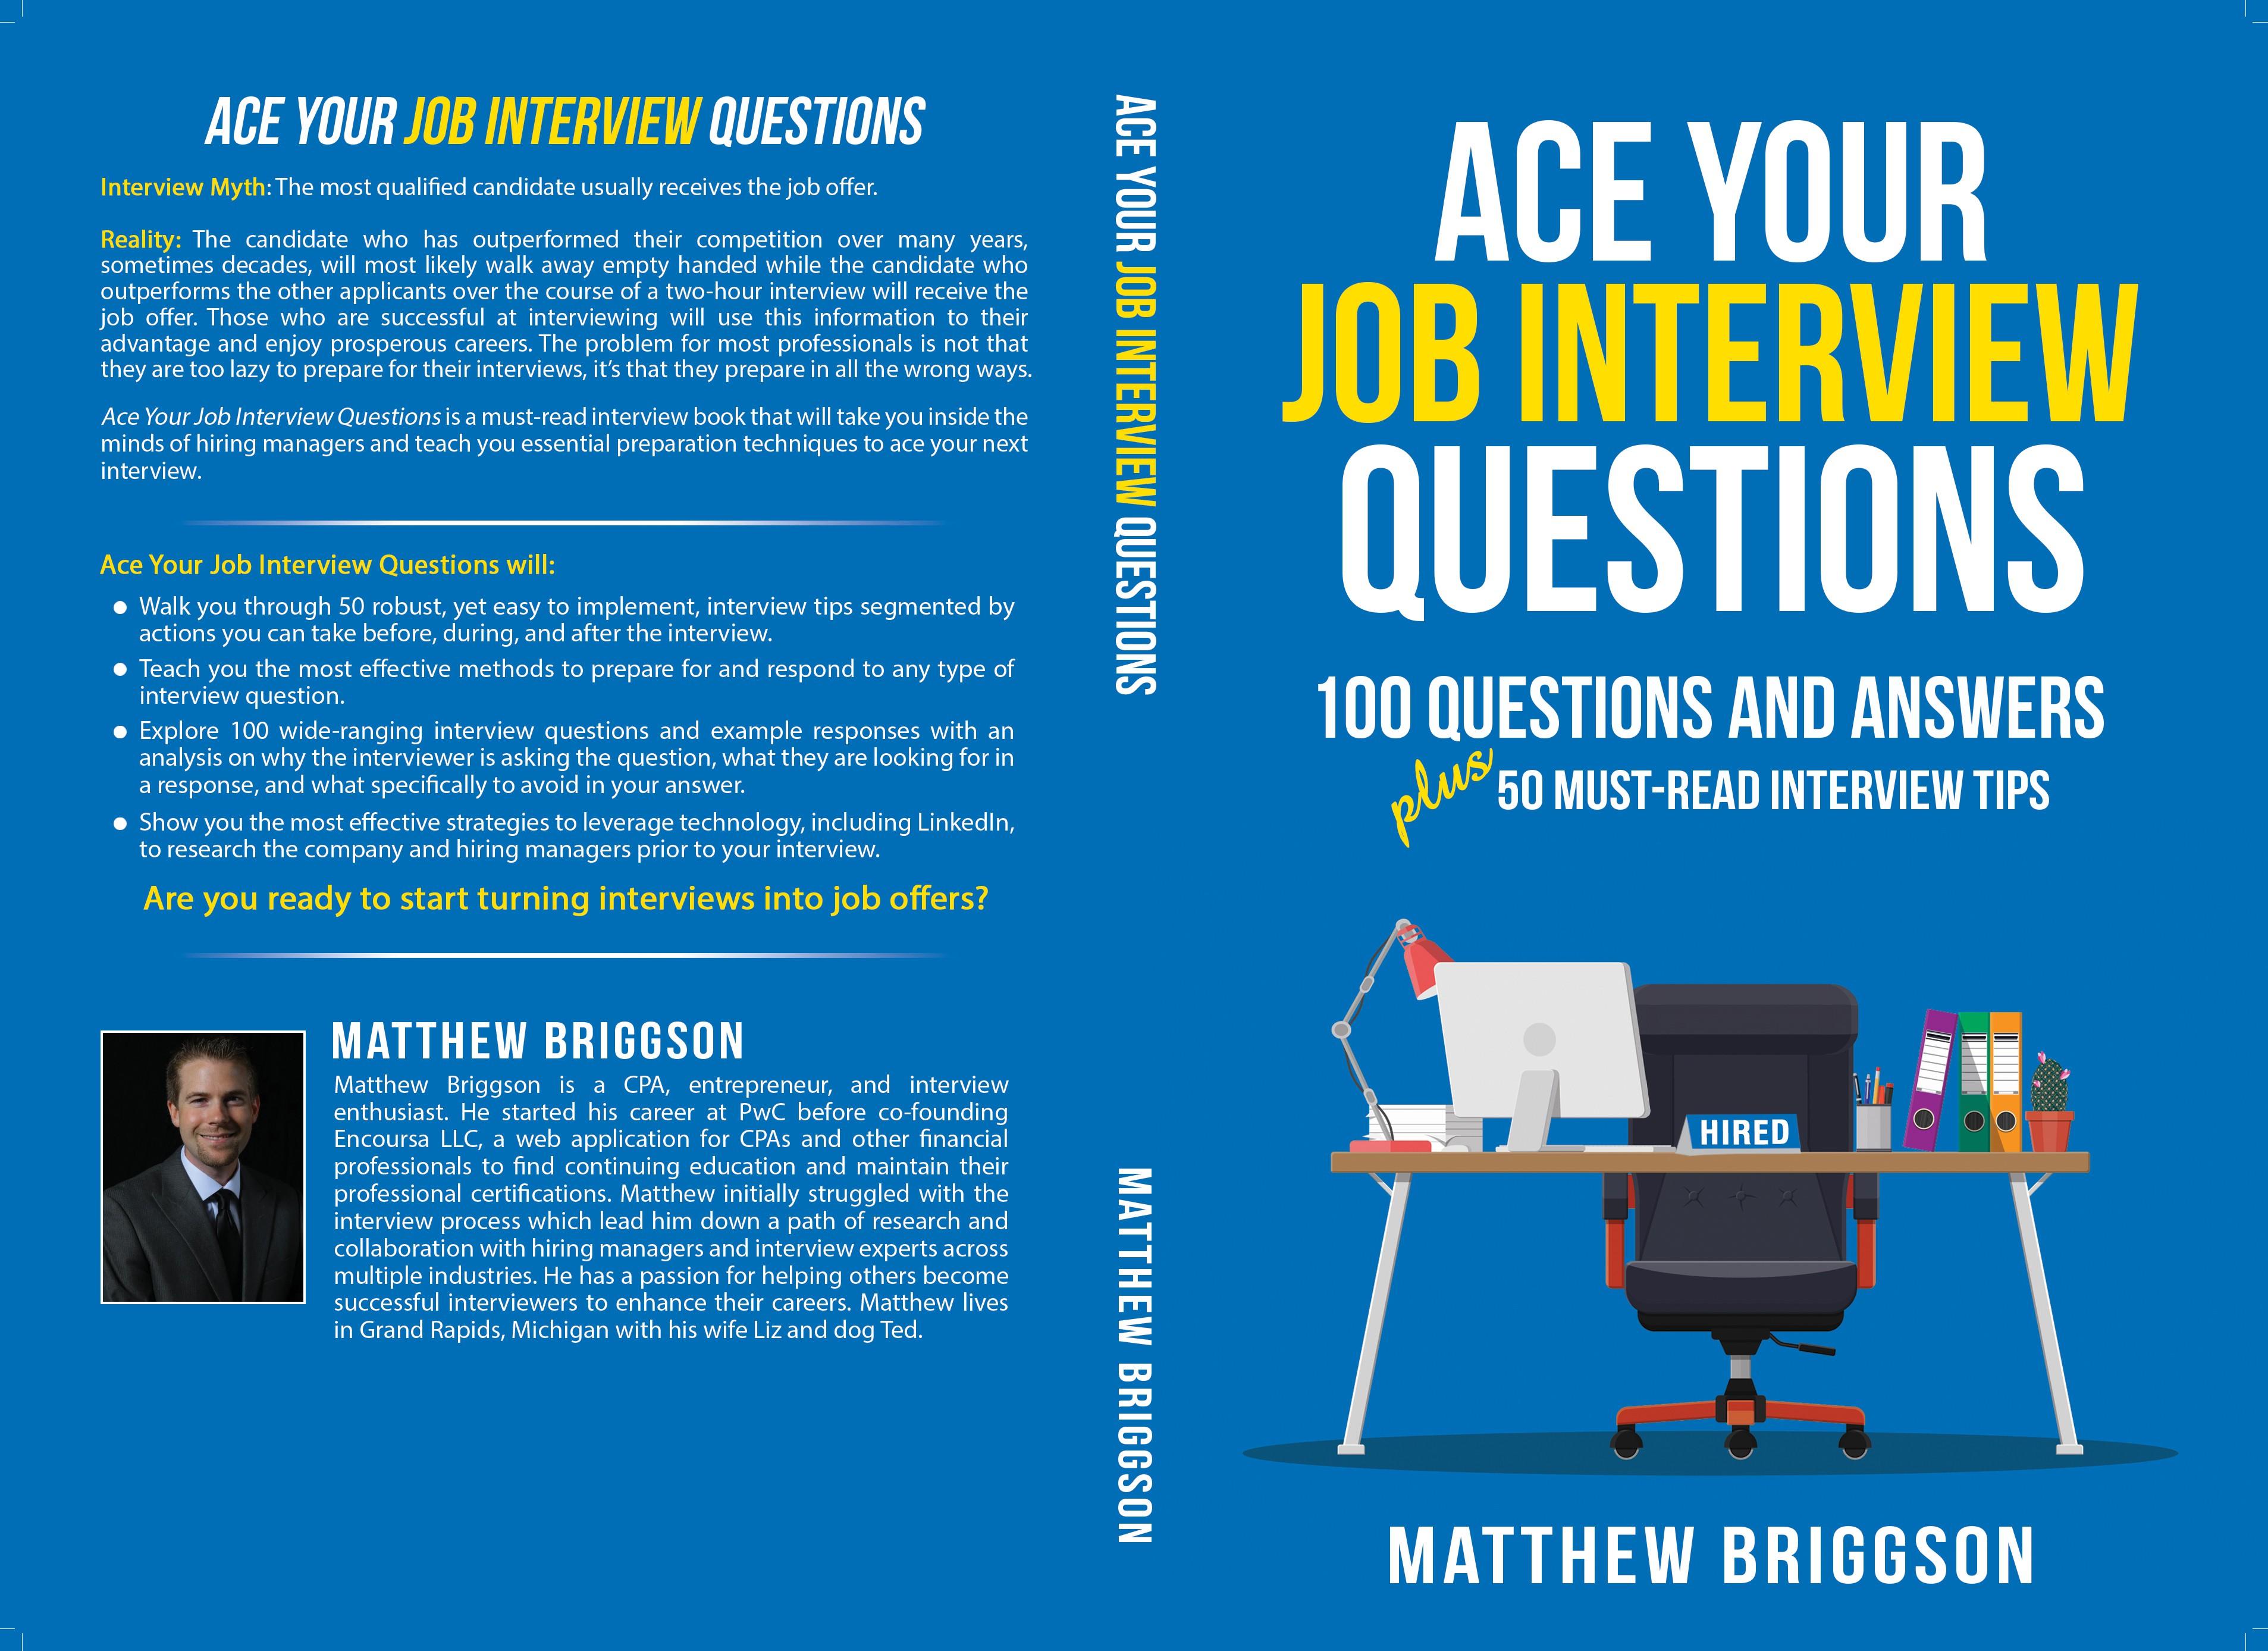 Design a book cover for a job interview book.